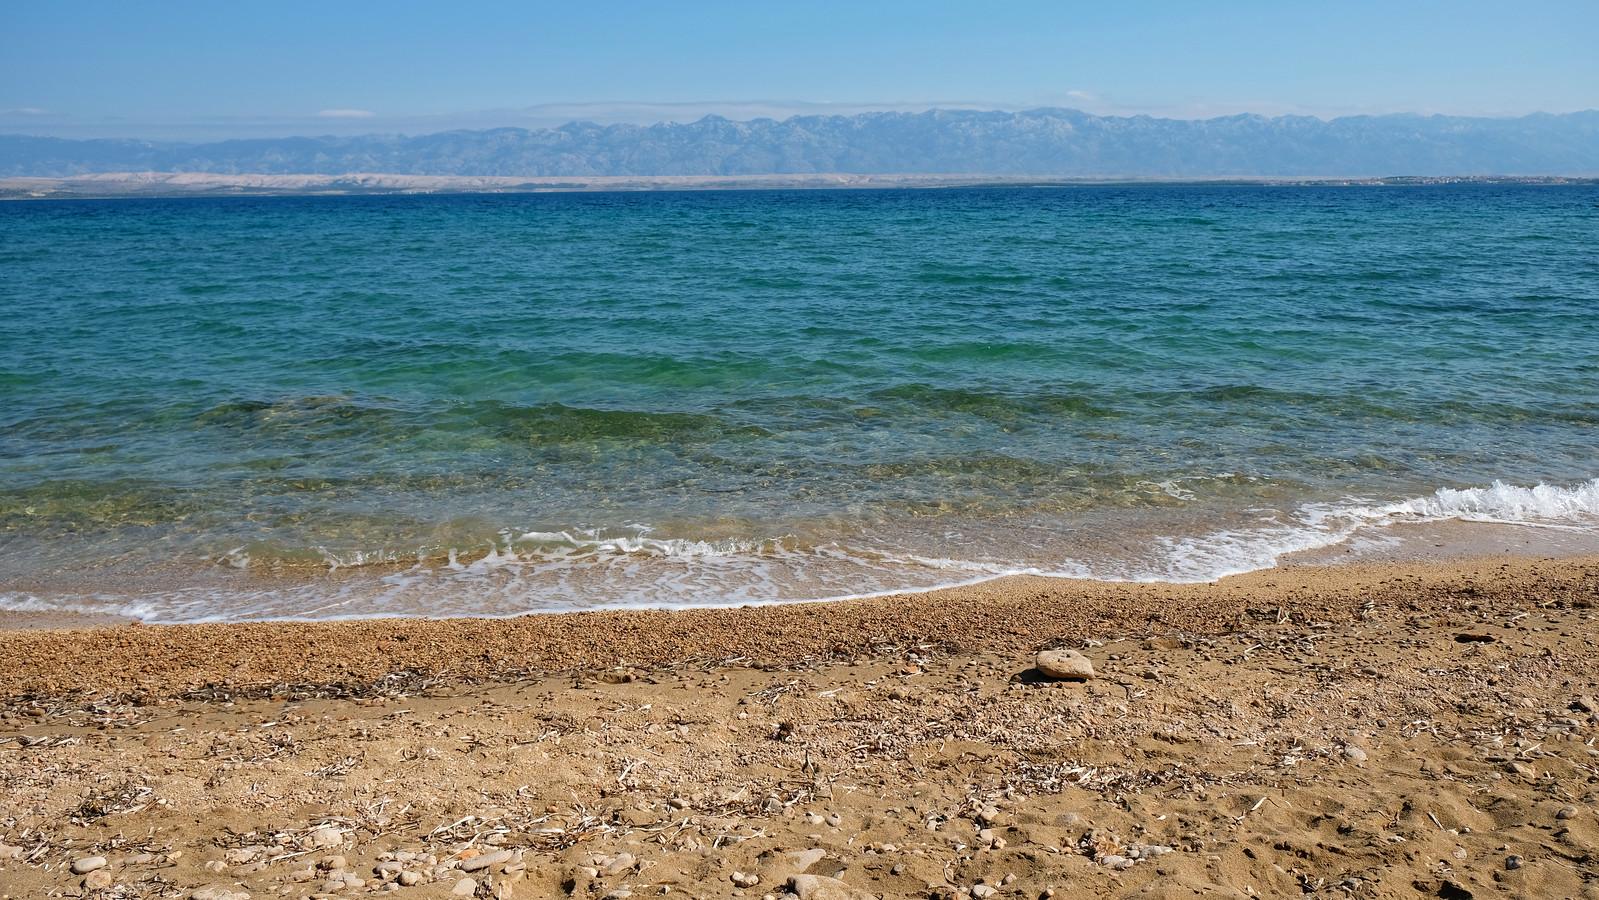 Crvenka Beach, Vir Island, Croatia